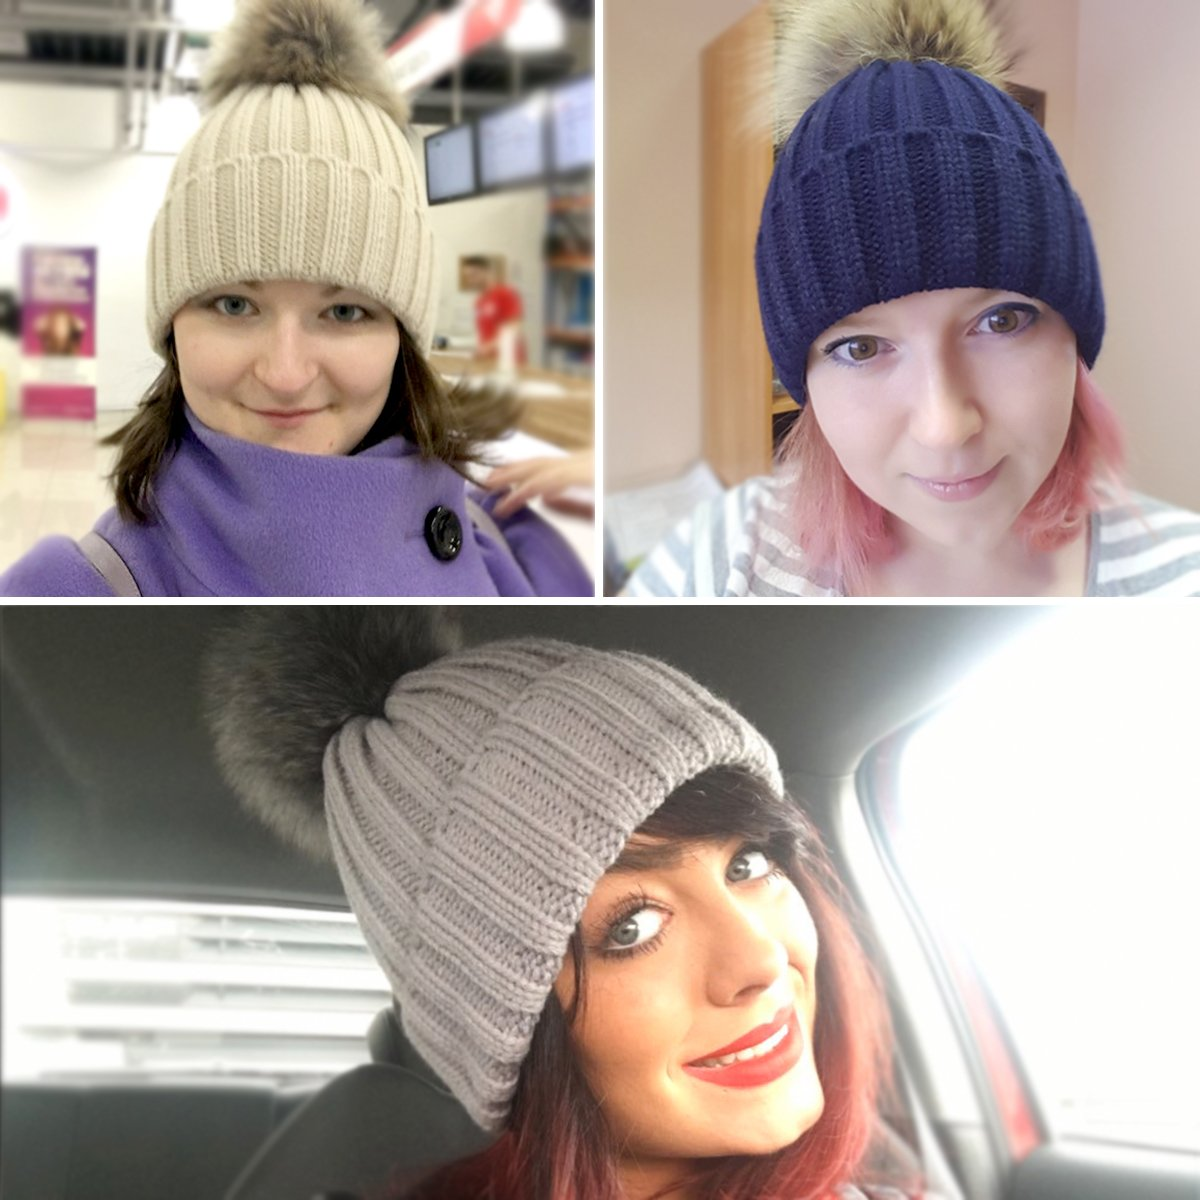 EVRFELAN Winter Hand Faux Fur Hat Pompoms Beanie Cable Knit Warm Family Crochet Ski Skull Cap for Girls (mink dark blue)